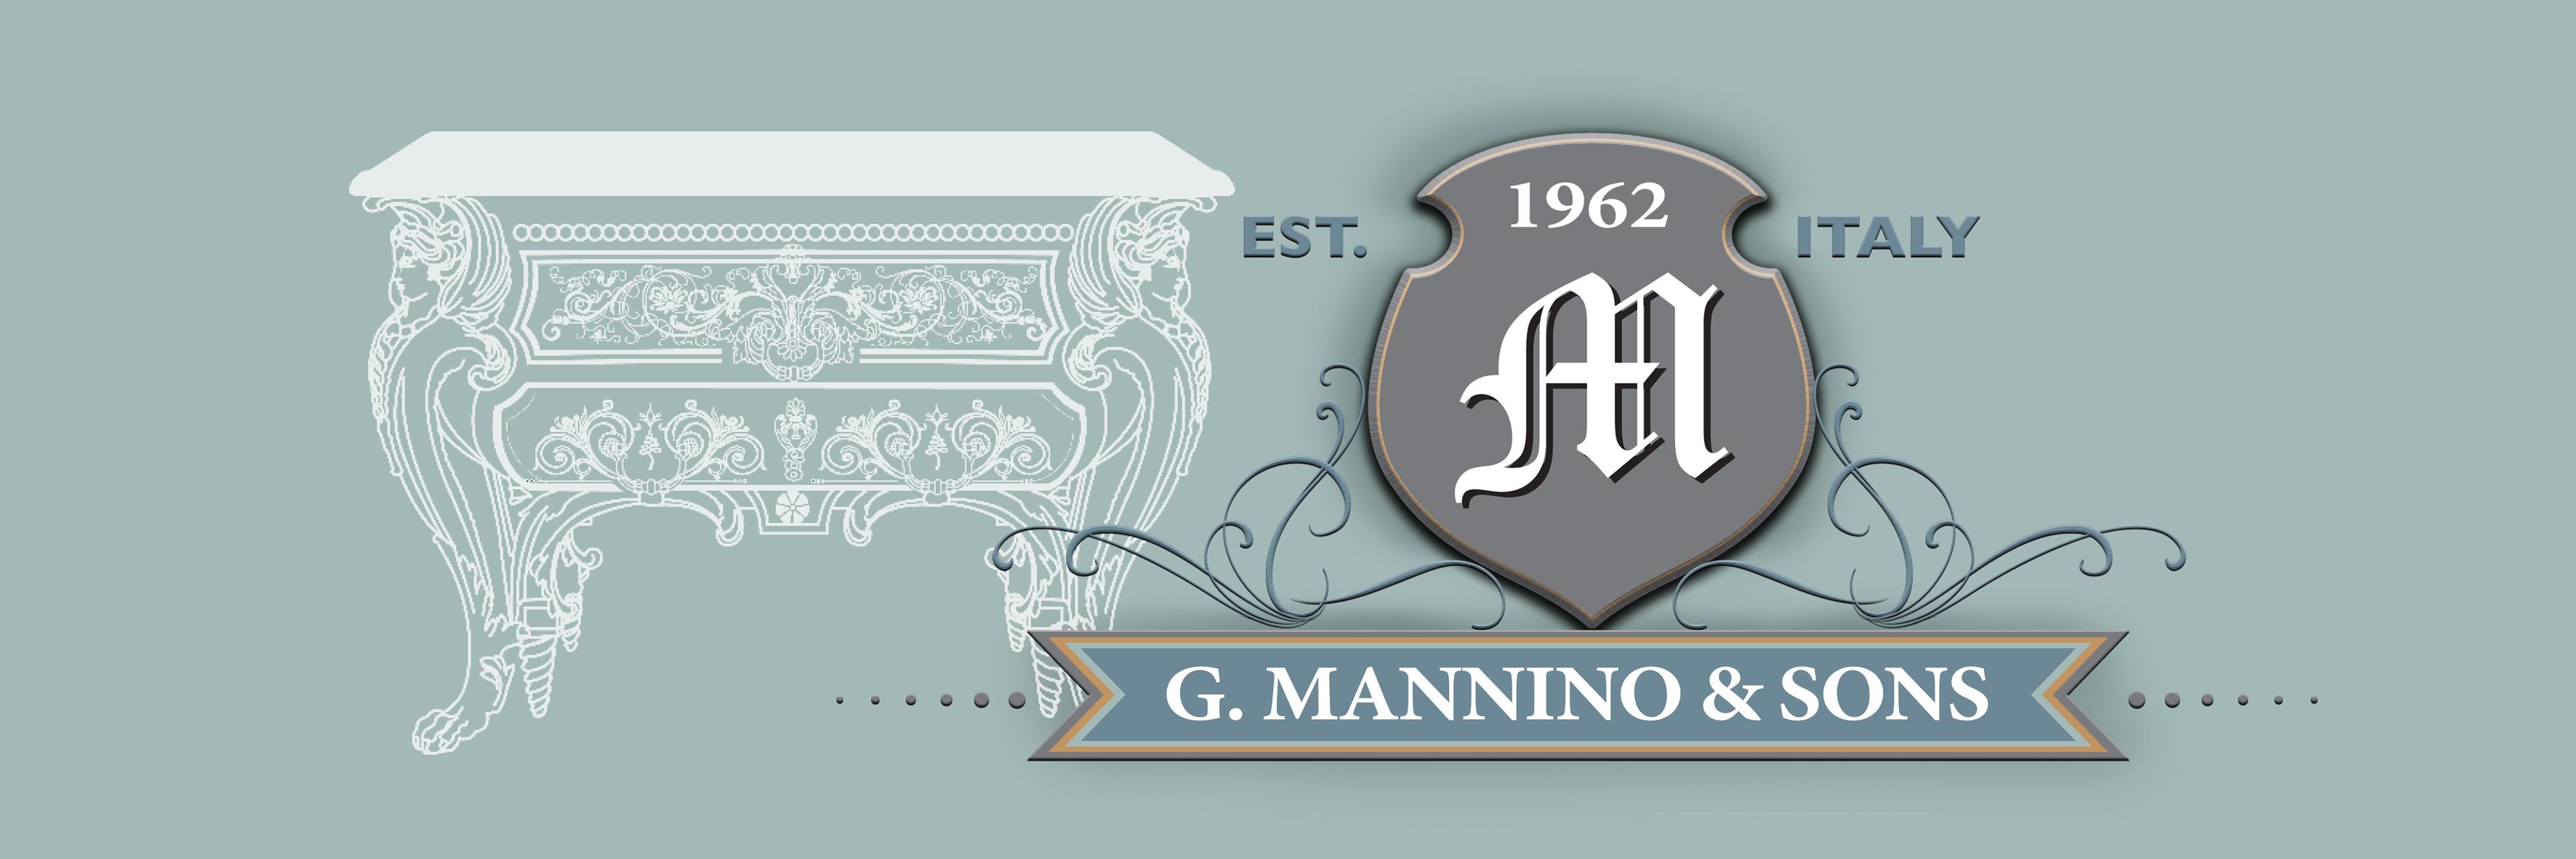 G Mannino & Sons